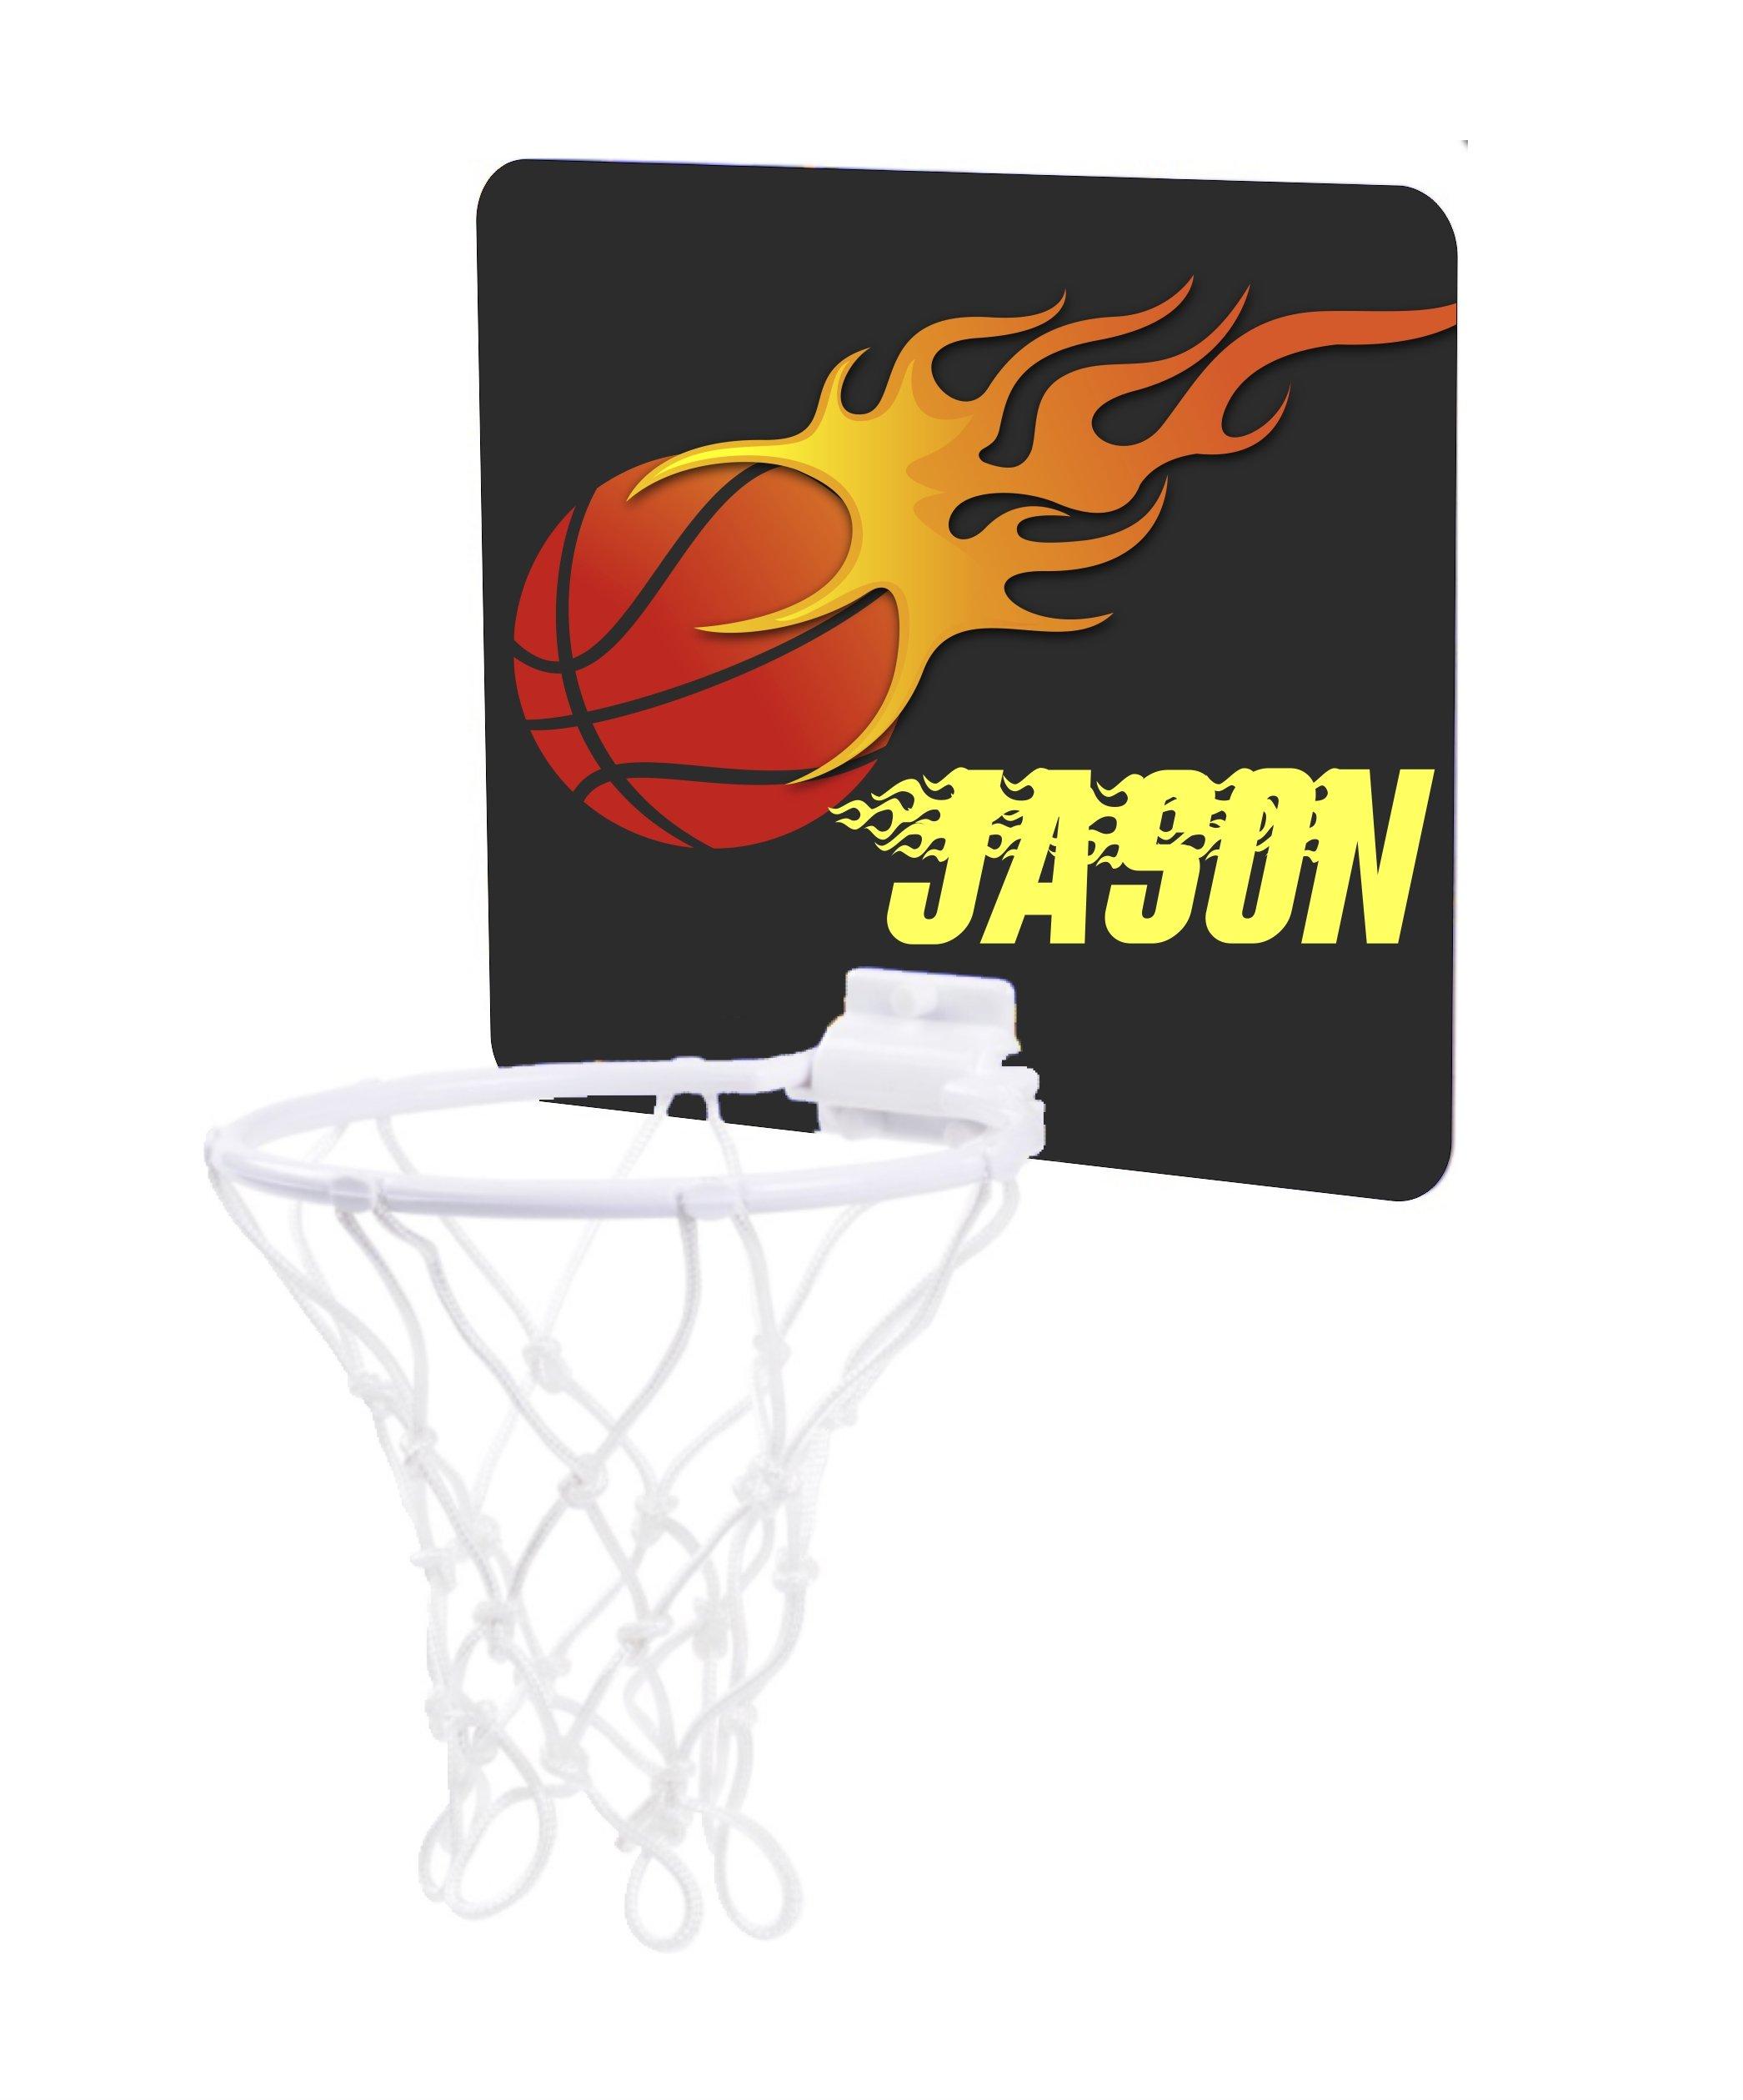 Jacks Outlet Flaming Basketball Design - Custom Unisex Childrens 7.5'' x 9'' Mini Basketball Backboard - Goal with 6'' Hoop